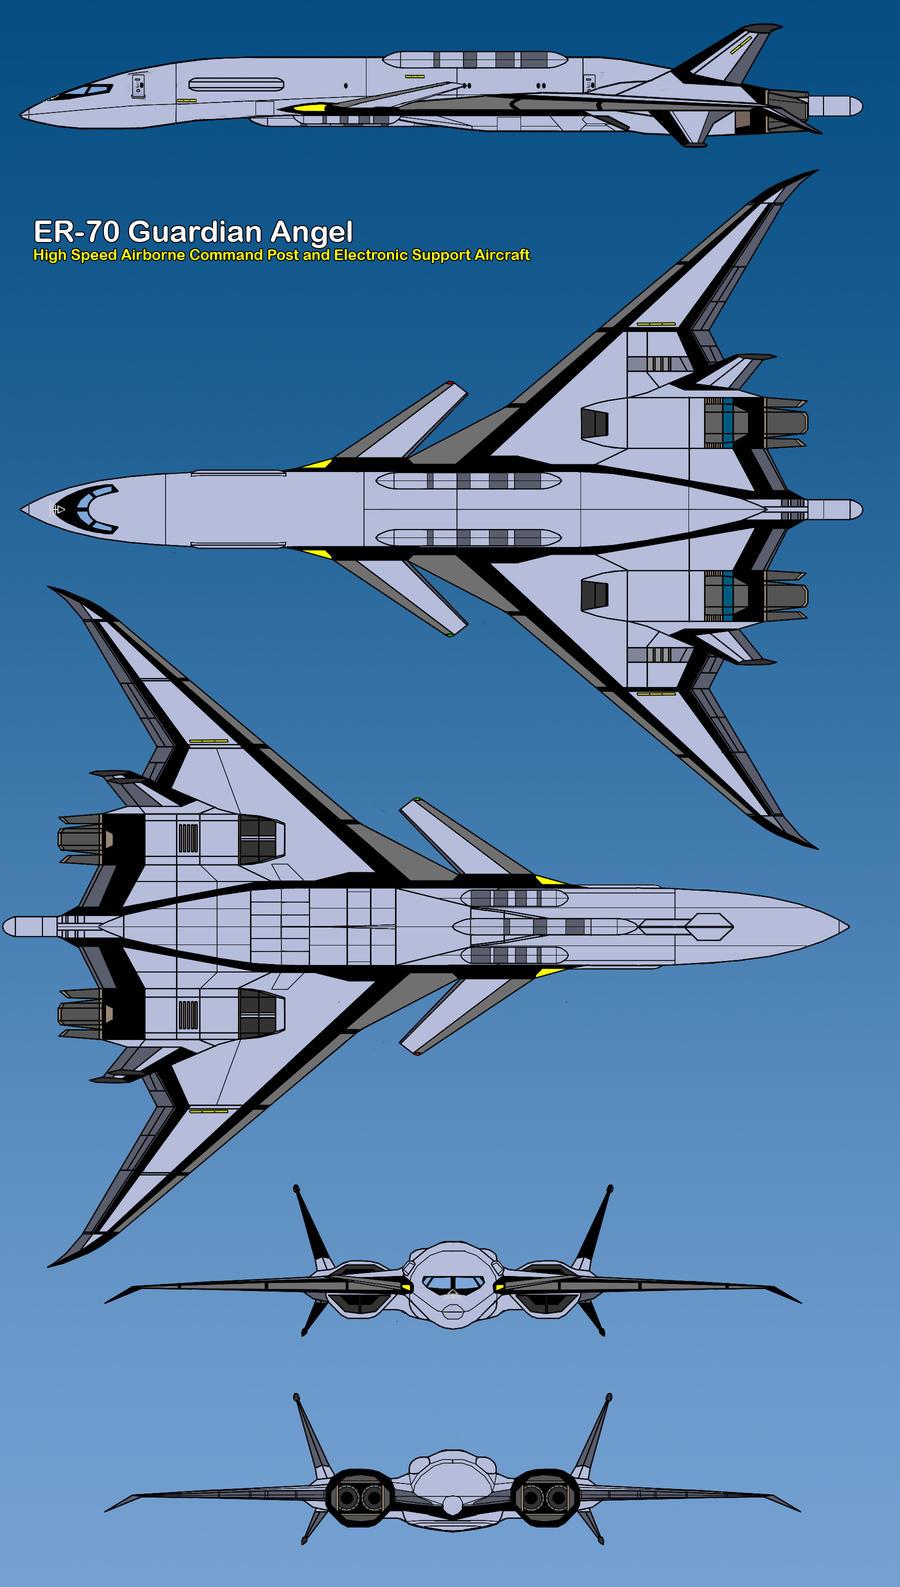 ER-70 Guardian Angel by haryopanji